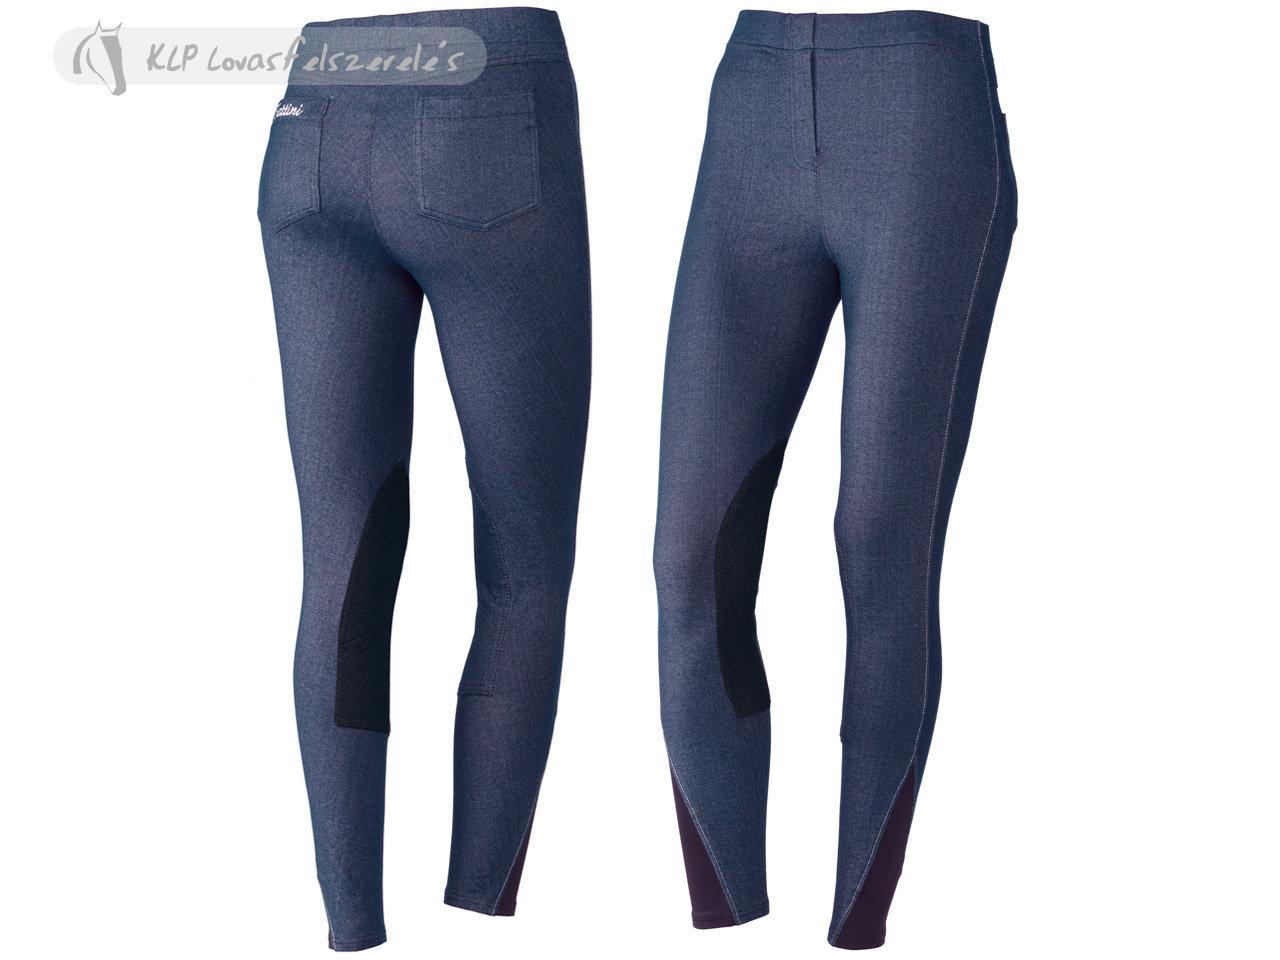 Lovaglónadrág Lány Térdbőrös Jeans Leggings Tattini